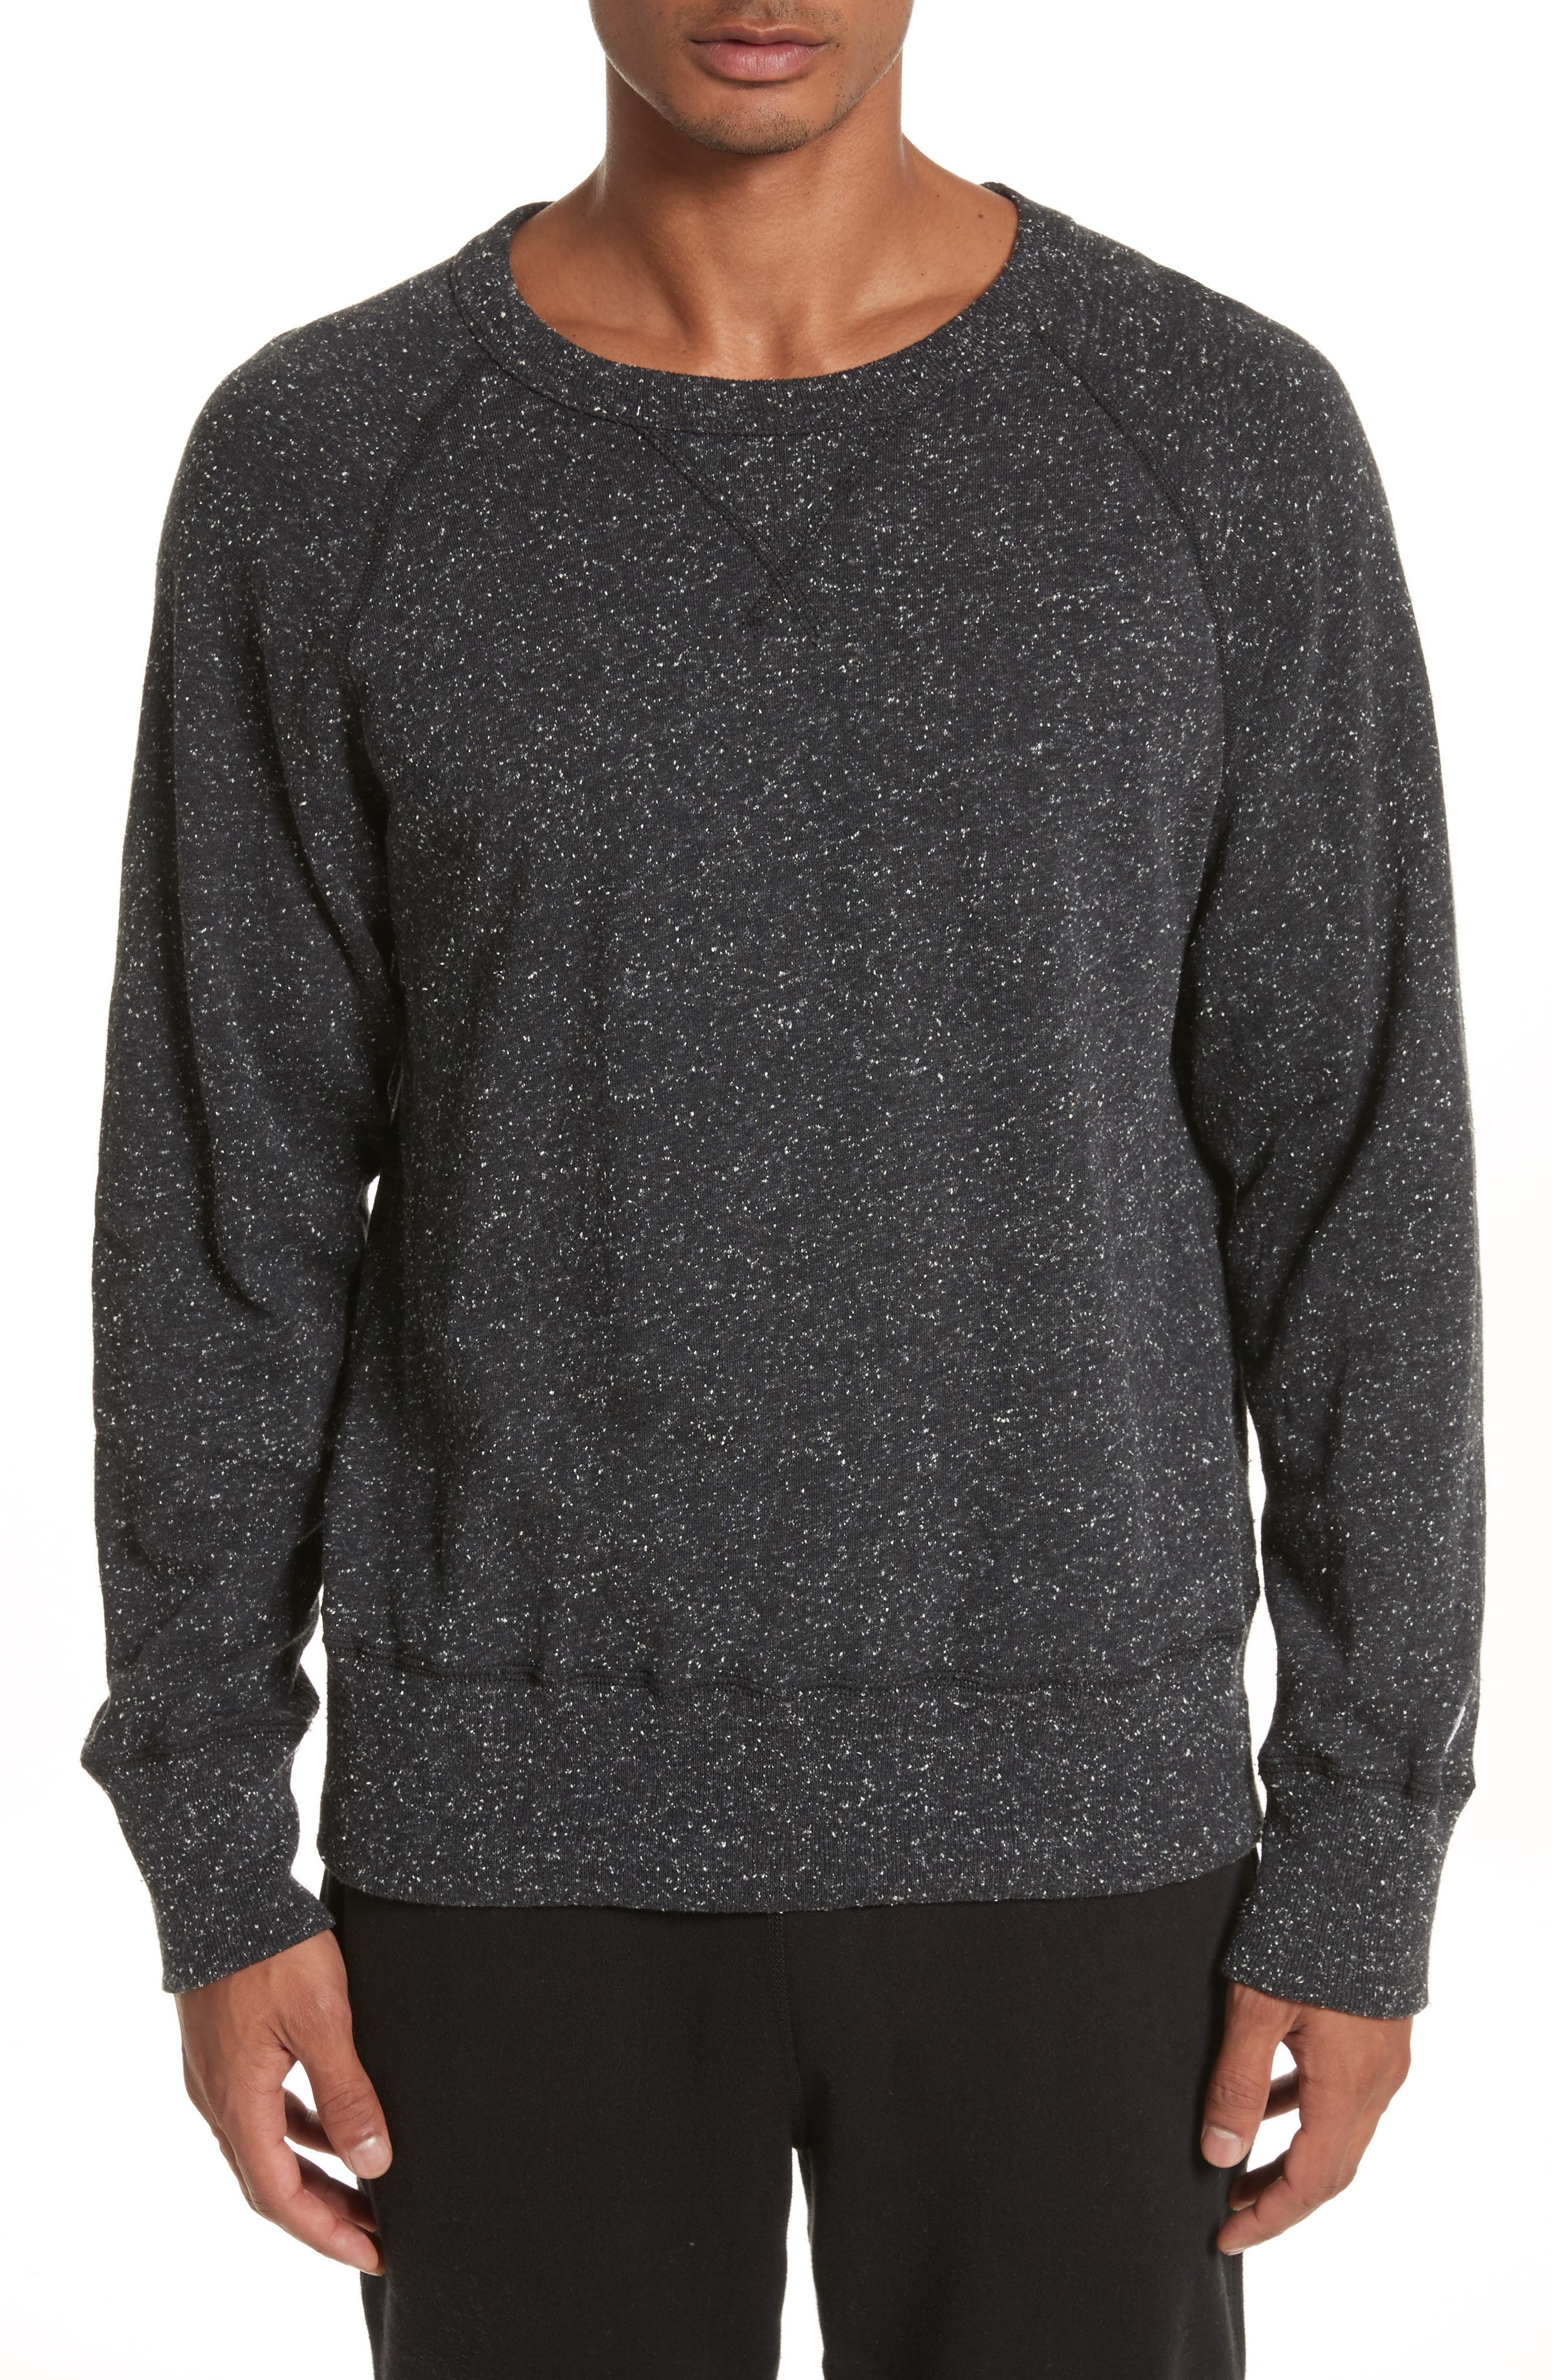 + Champion Heathered Crewneck Sweatshirt,                             Main thumbnail 1, color,                             Black